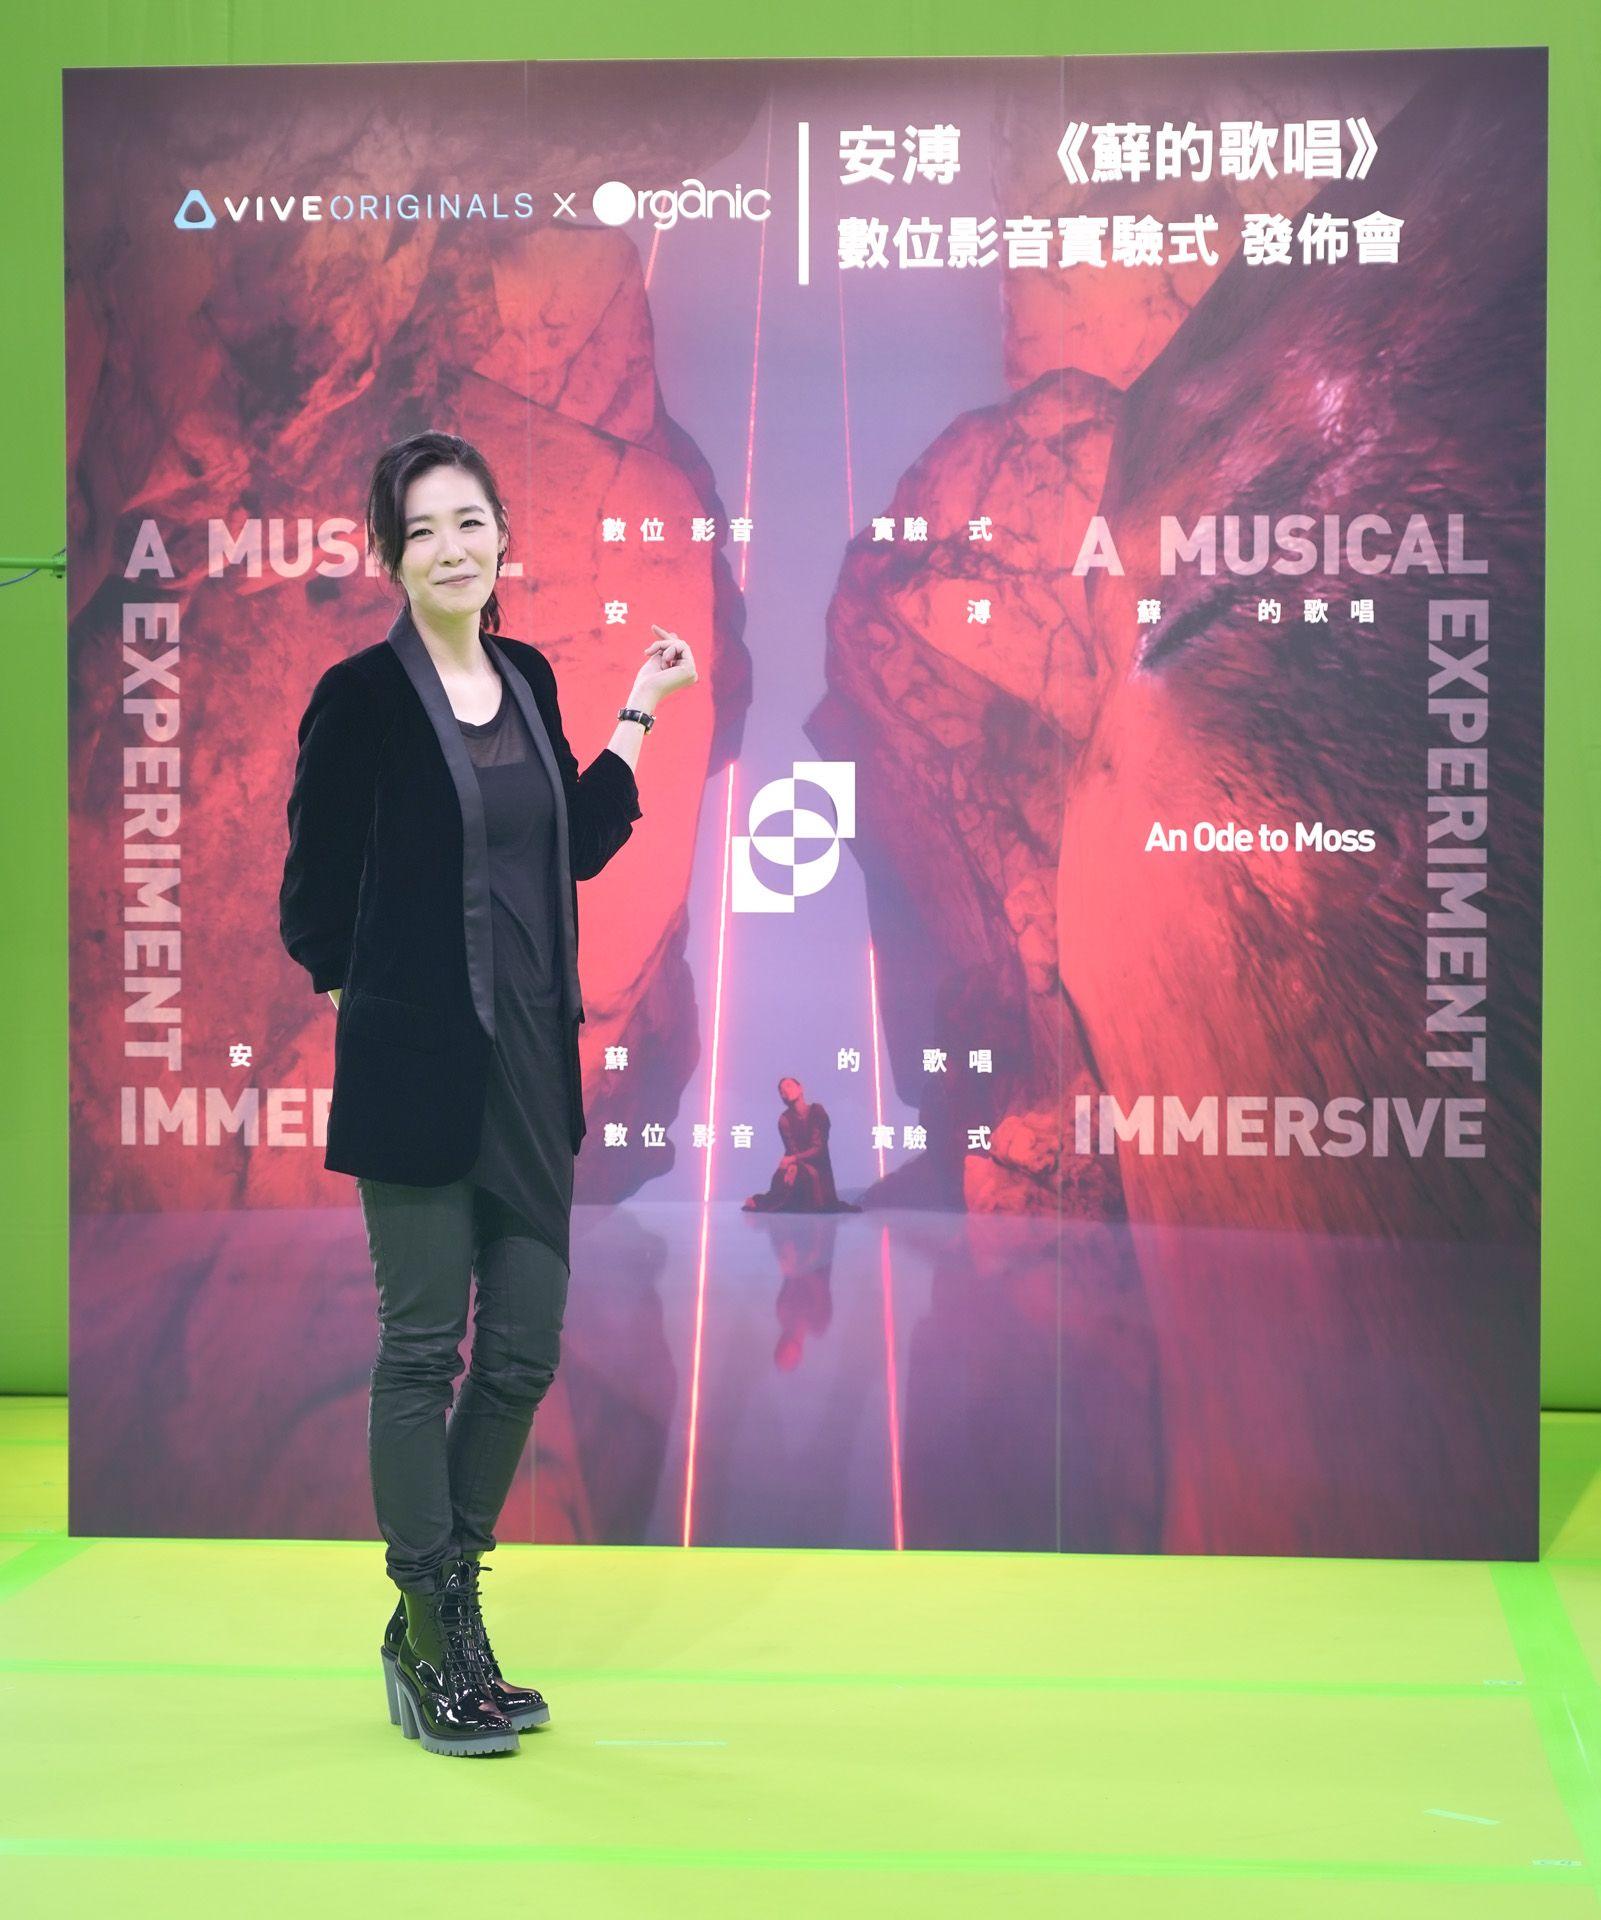 HTC VIVE ORIGINALS宏達電攜手視覺特效團隊「有機像素」,共創XR互動音樂作品安溥 《蘚的歌唱》